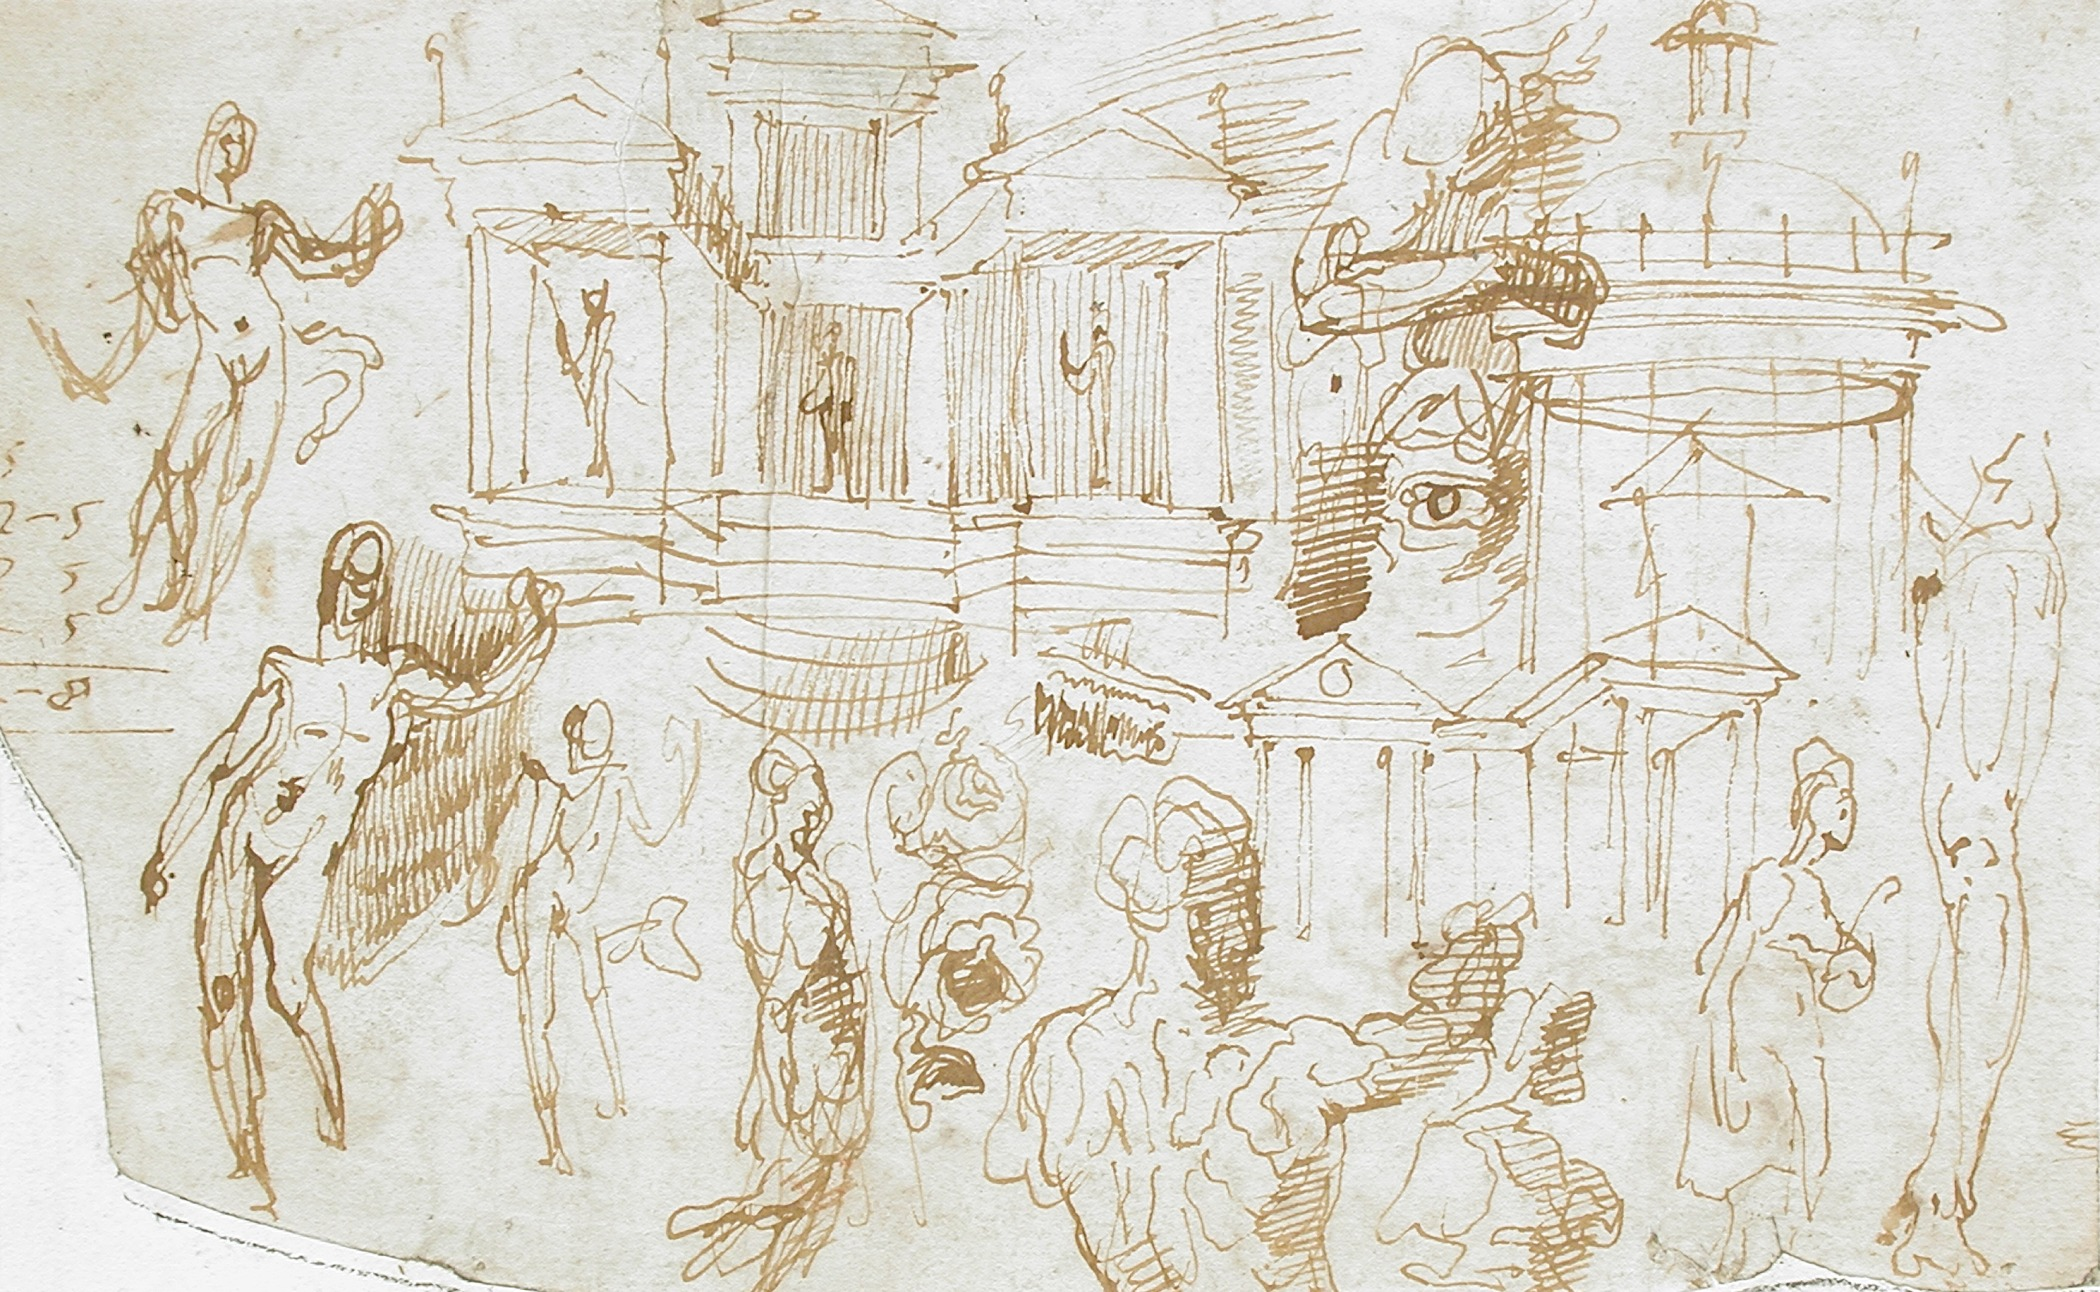 Attirant File:Sheet Of Figural, Ornamental And Architectural Studies (recto And  Verso) LACMA